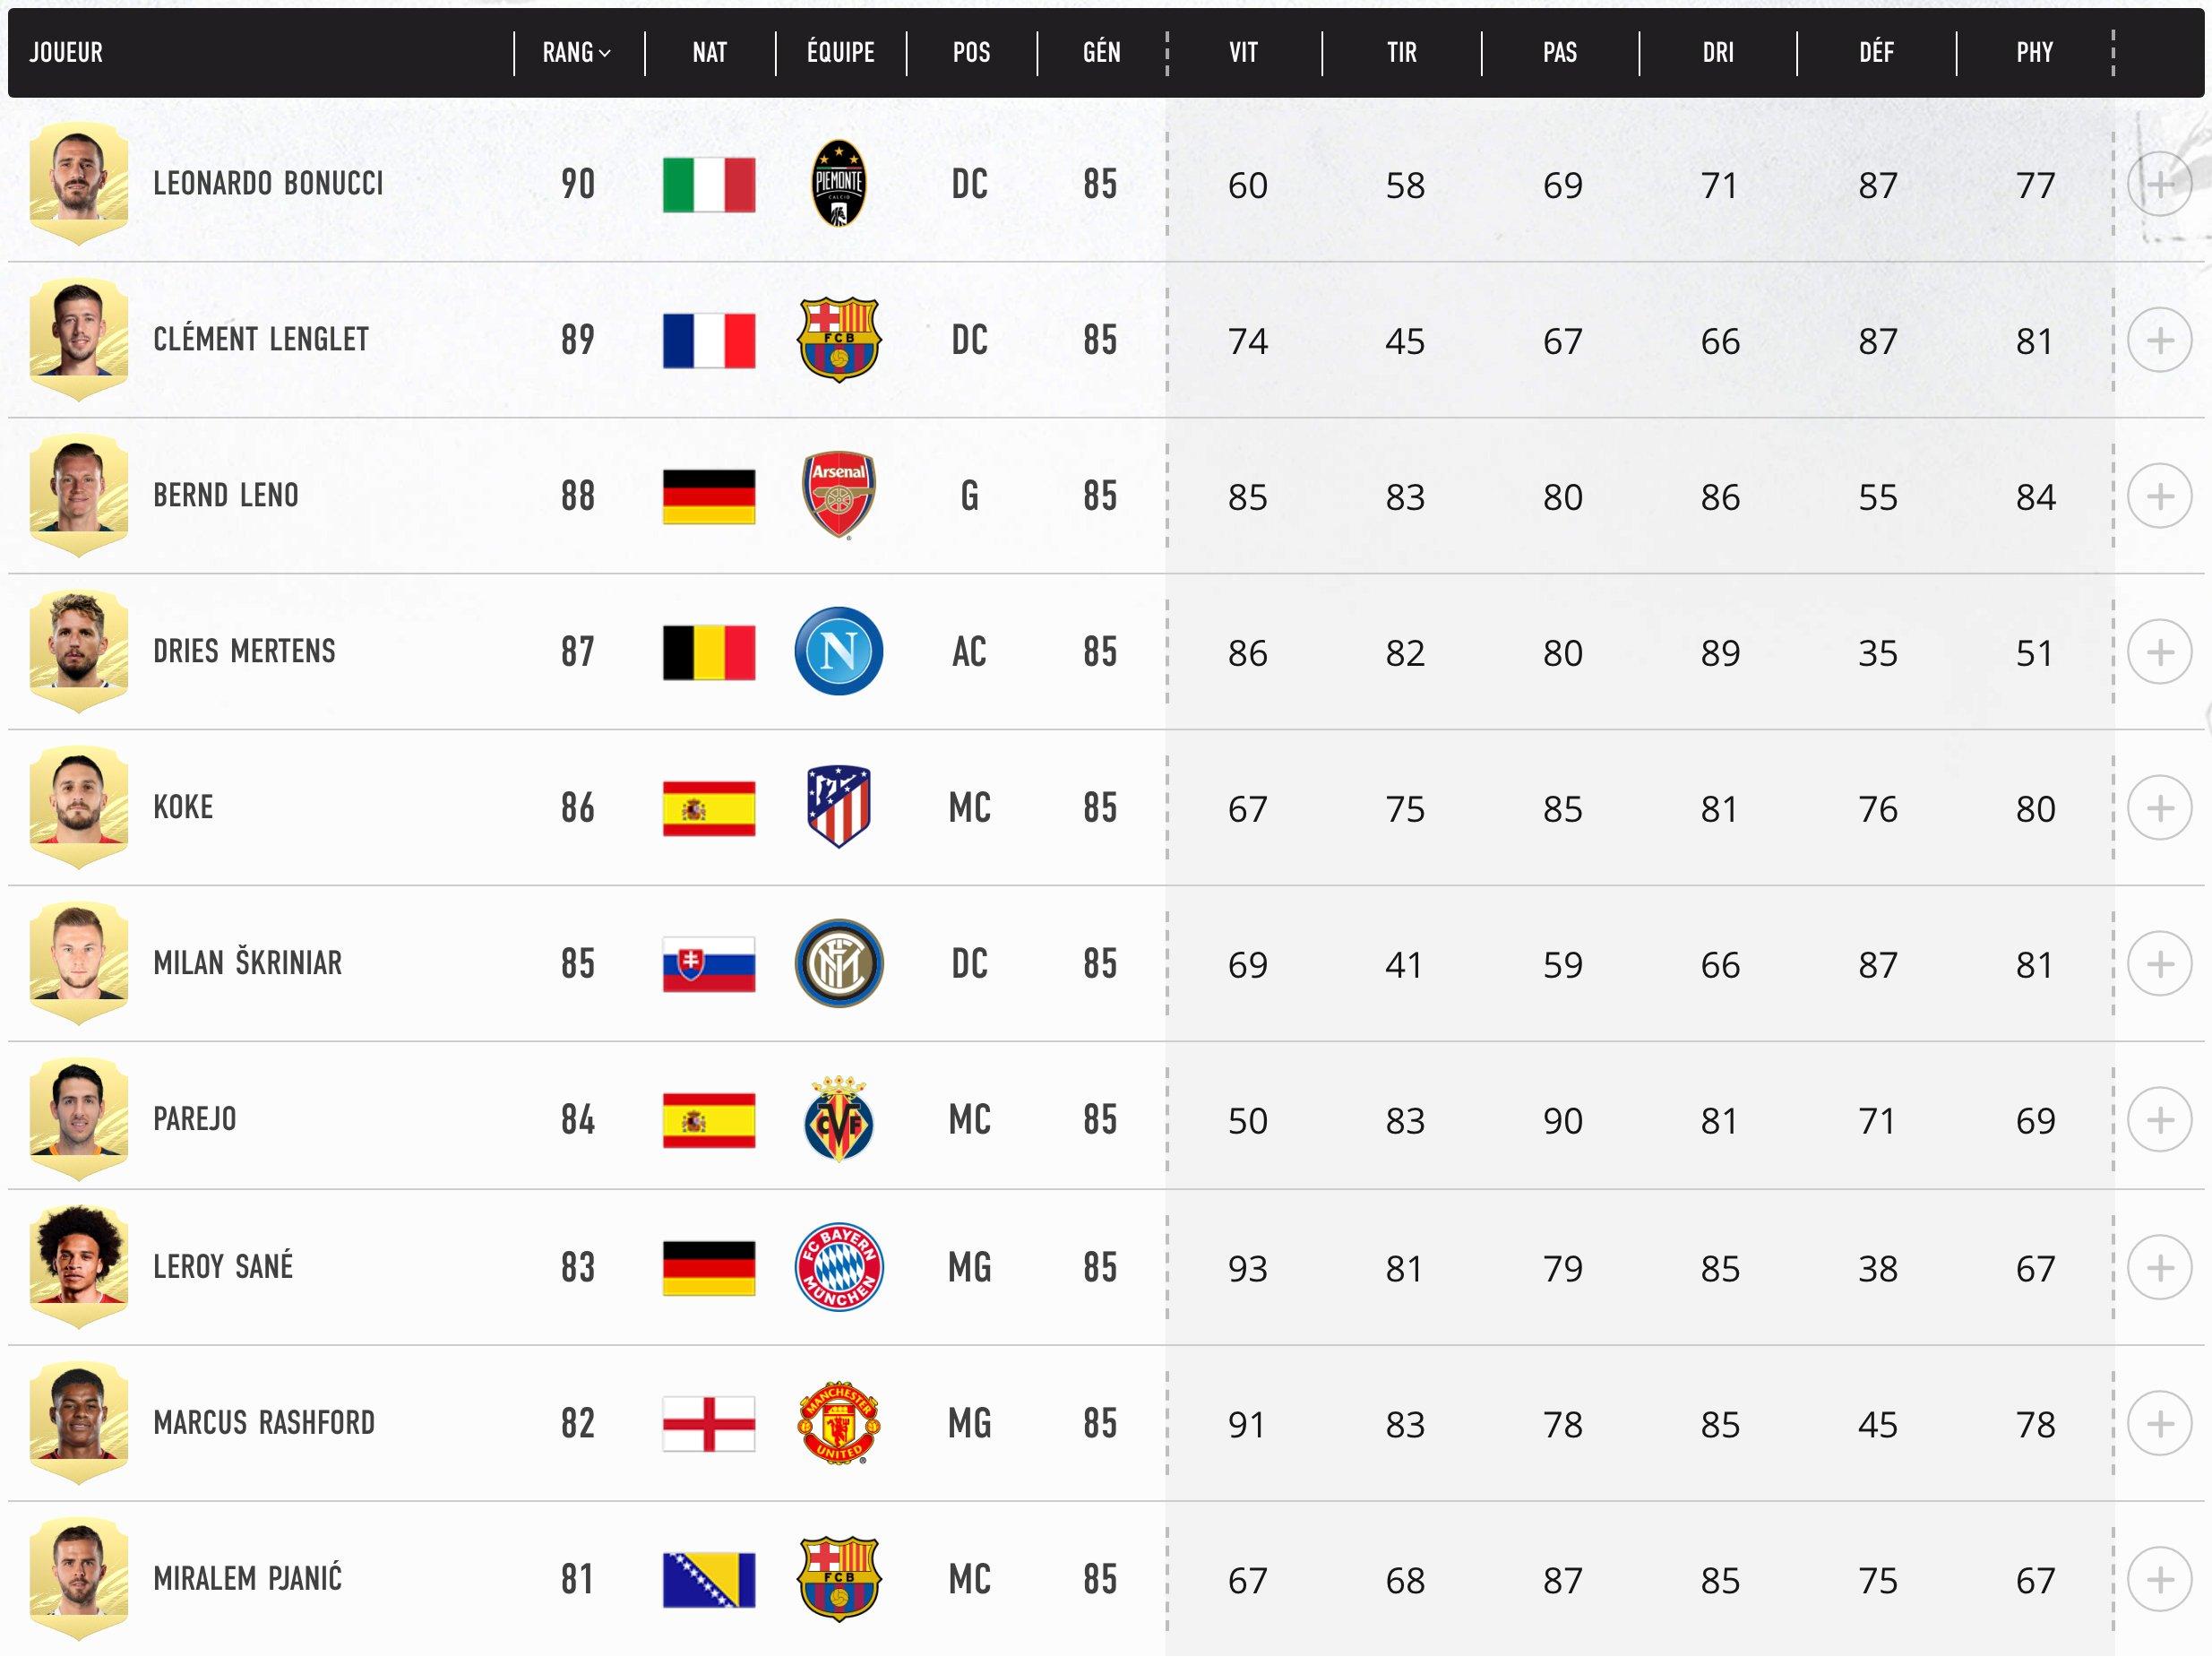 Top 90-81 Meilleurs Joueurs FIFA 21